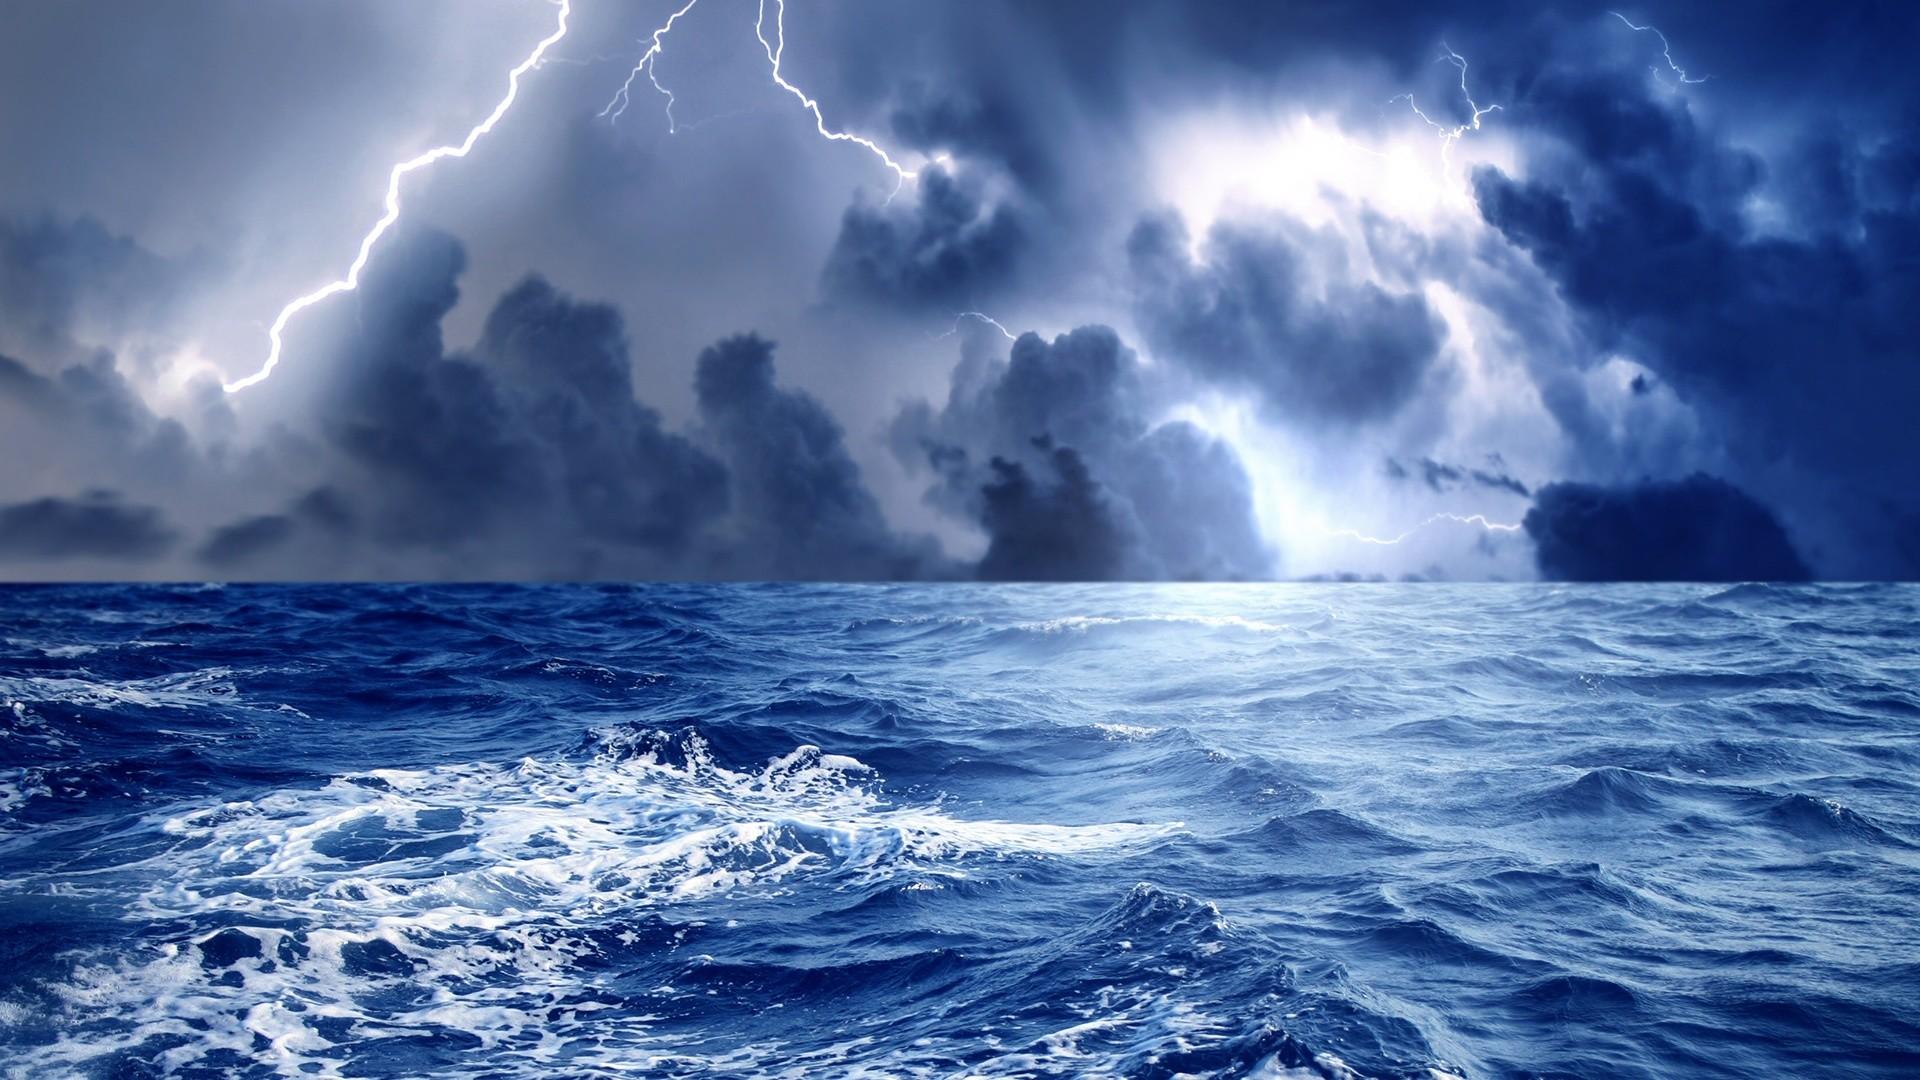 Lightning wallpapers for Sky backgrounds. Desktop wallpaper free images for  desktop backgrounds